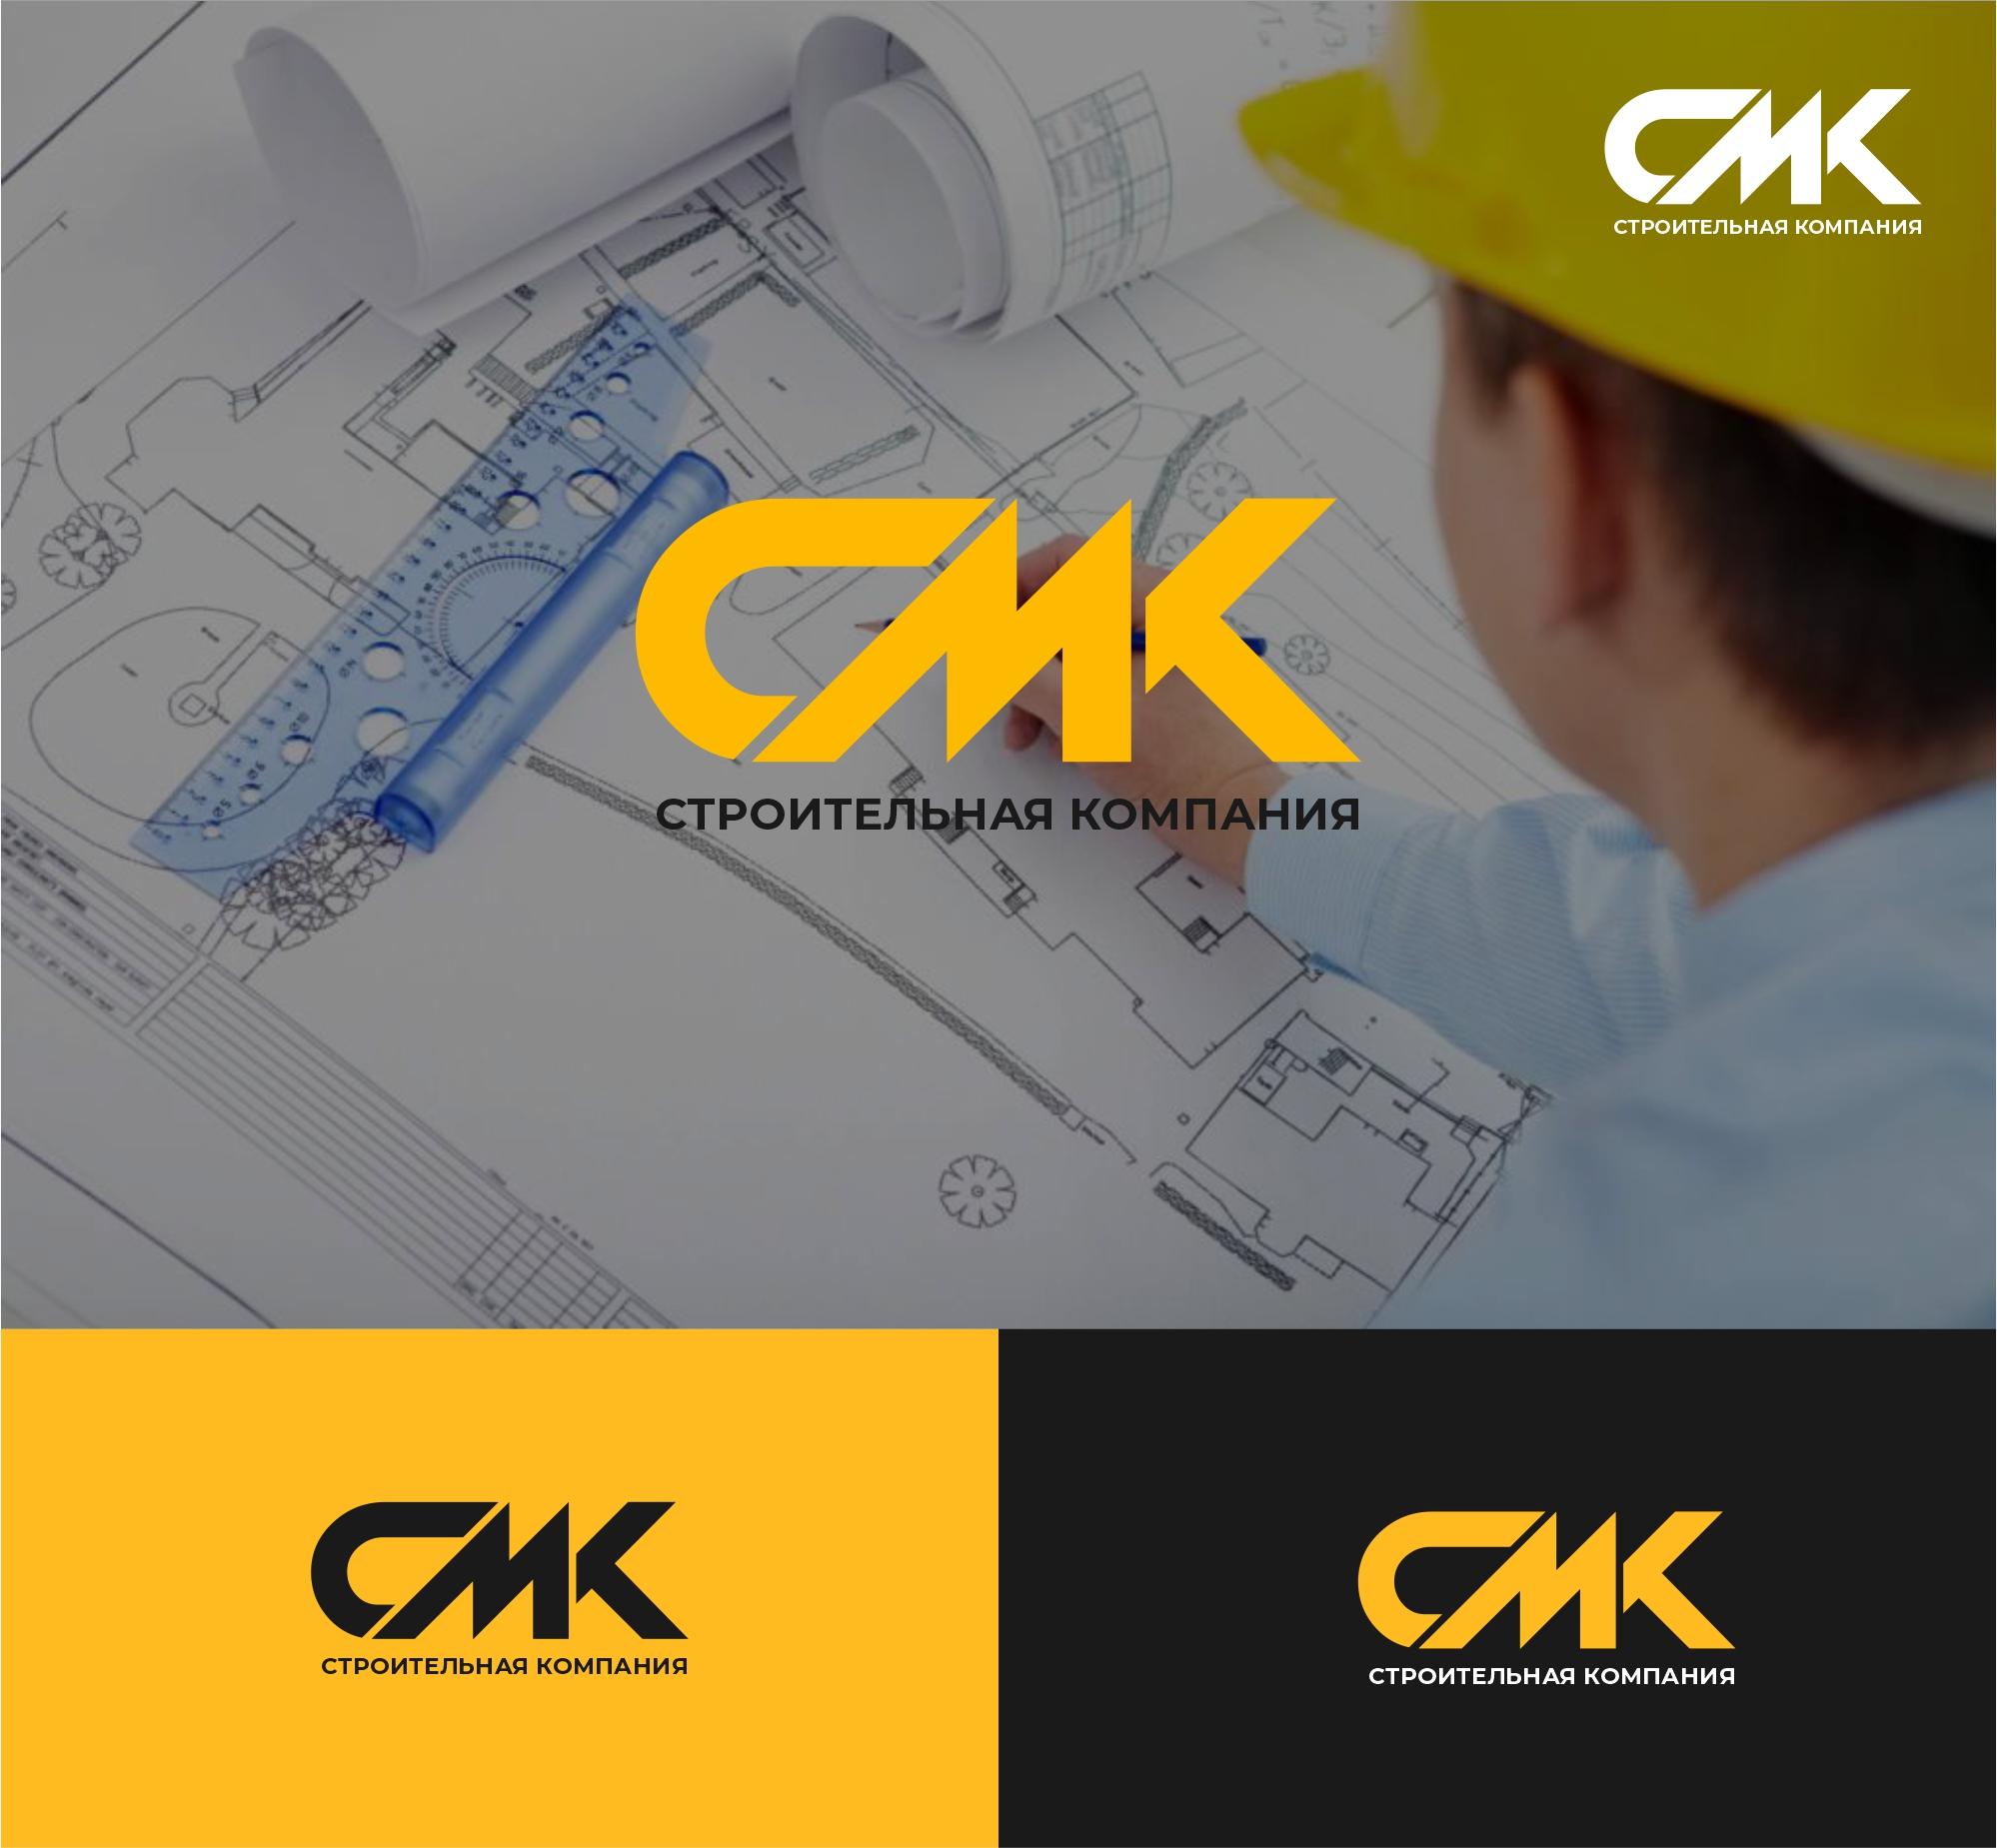 Разработка логотипа компании фото f_9485de11902805e6.jpg